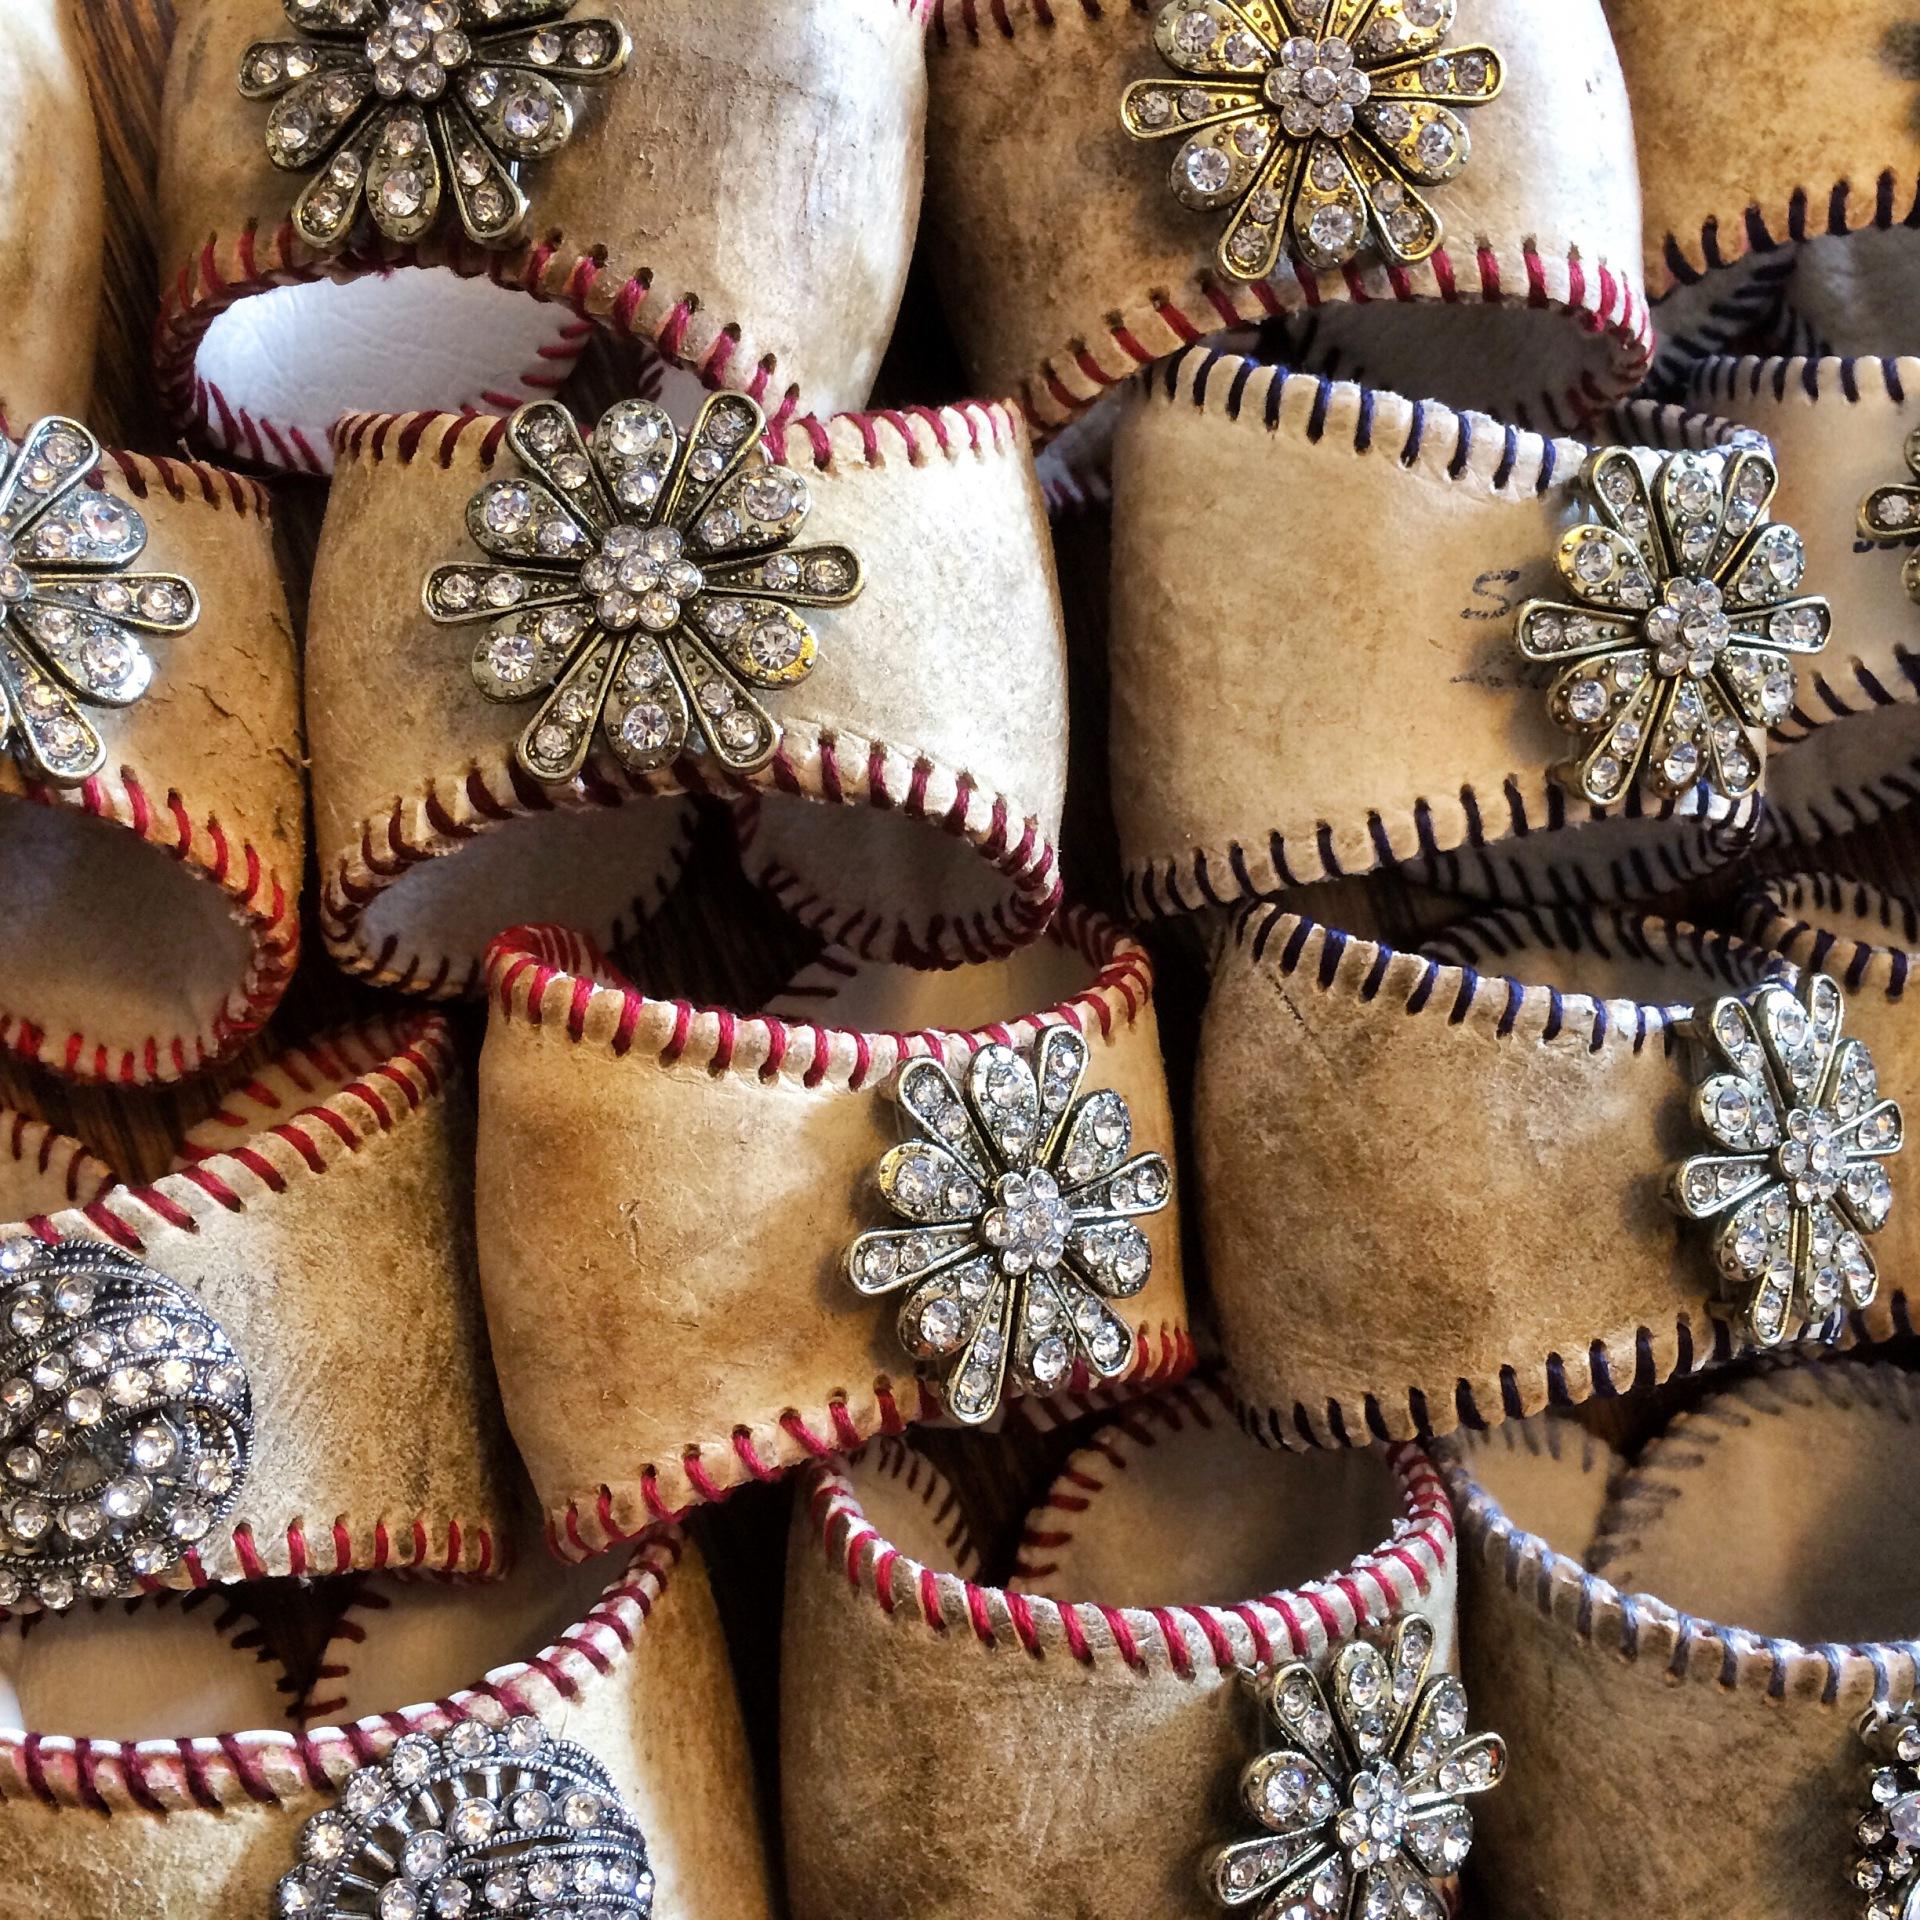 Rustic Baseball Cuffs